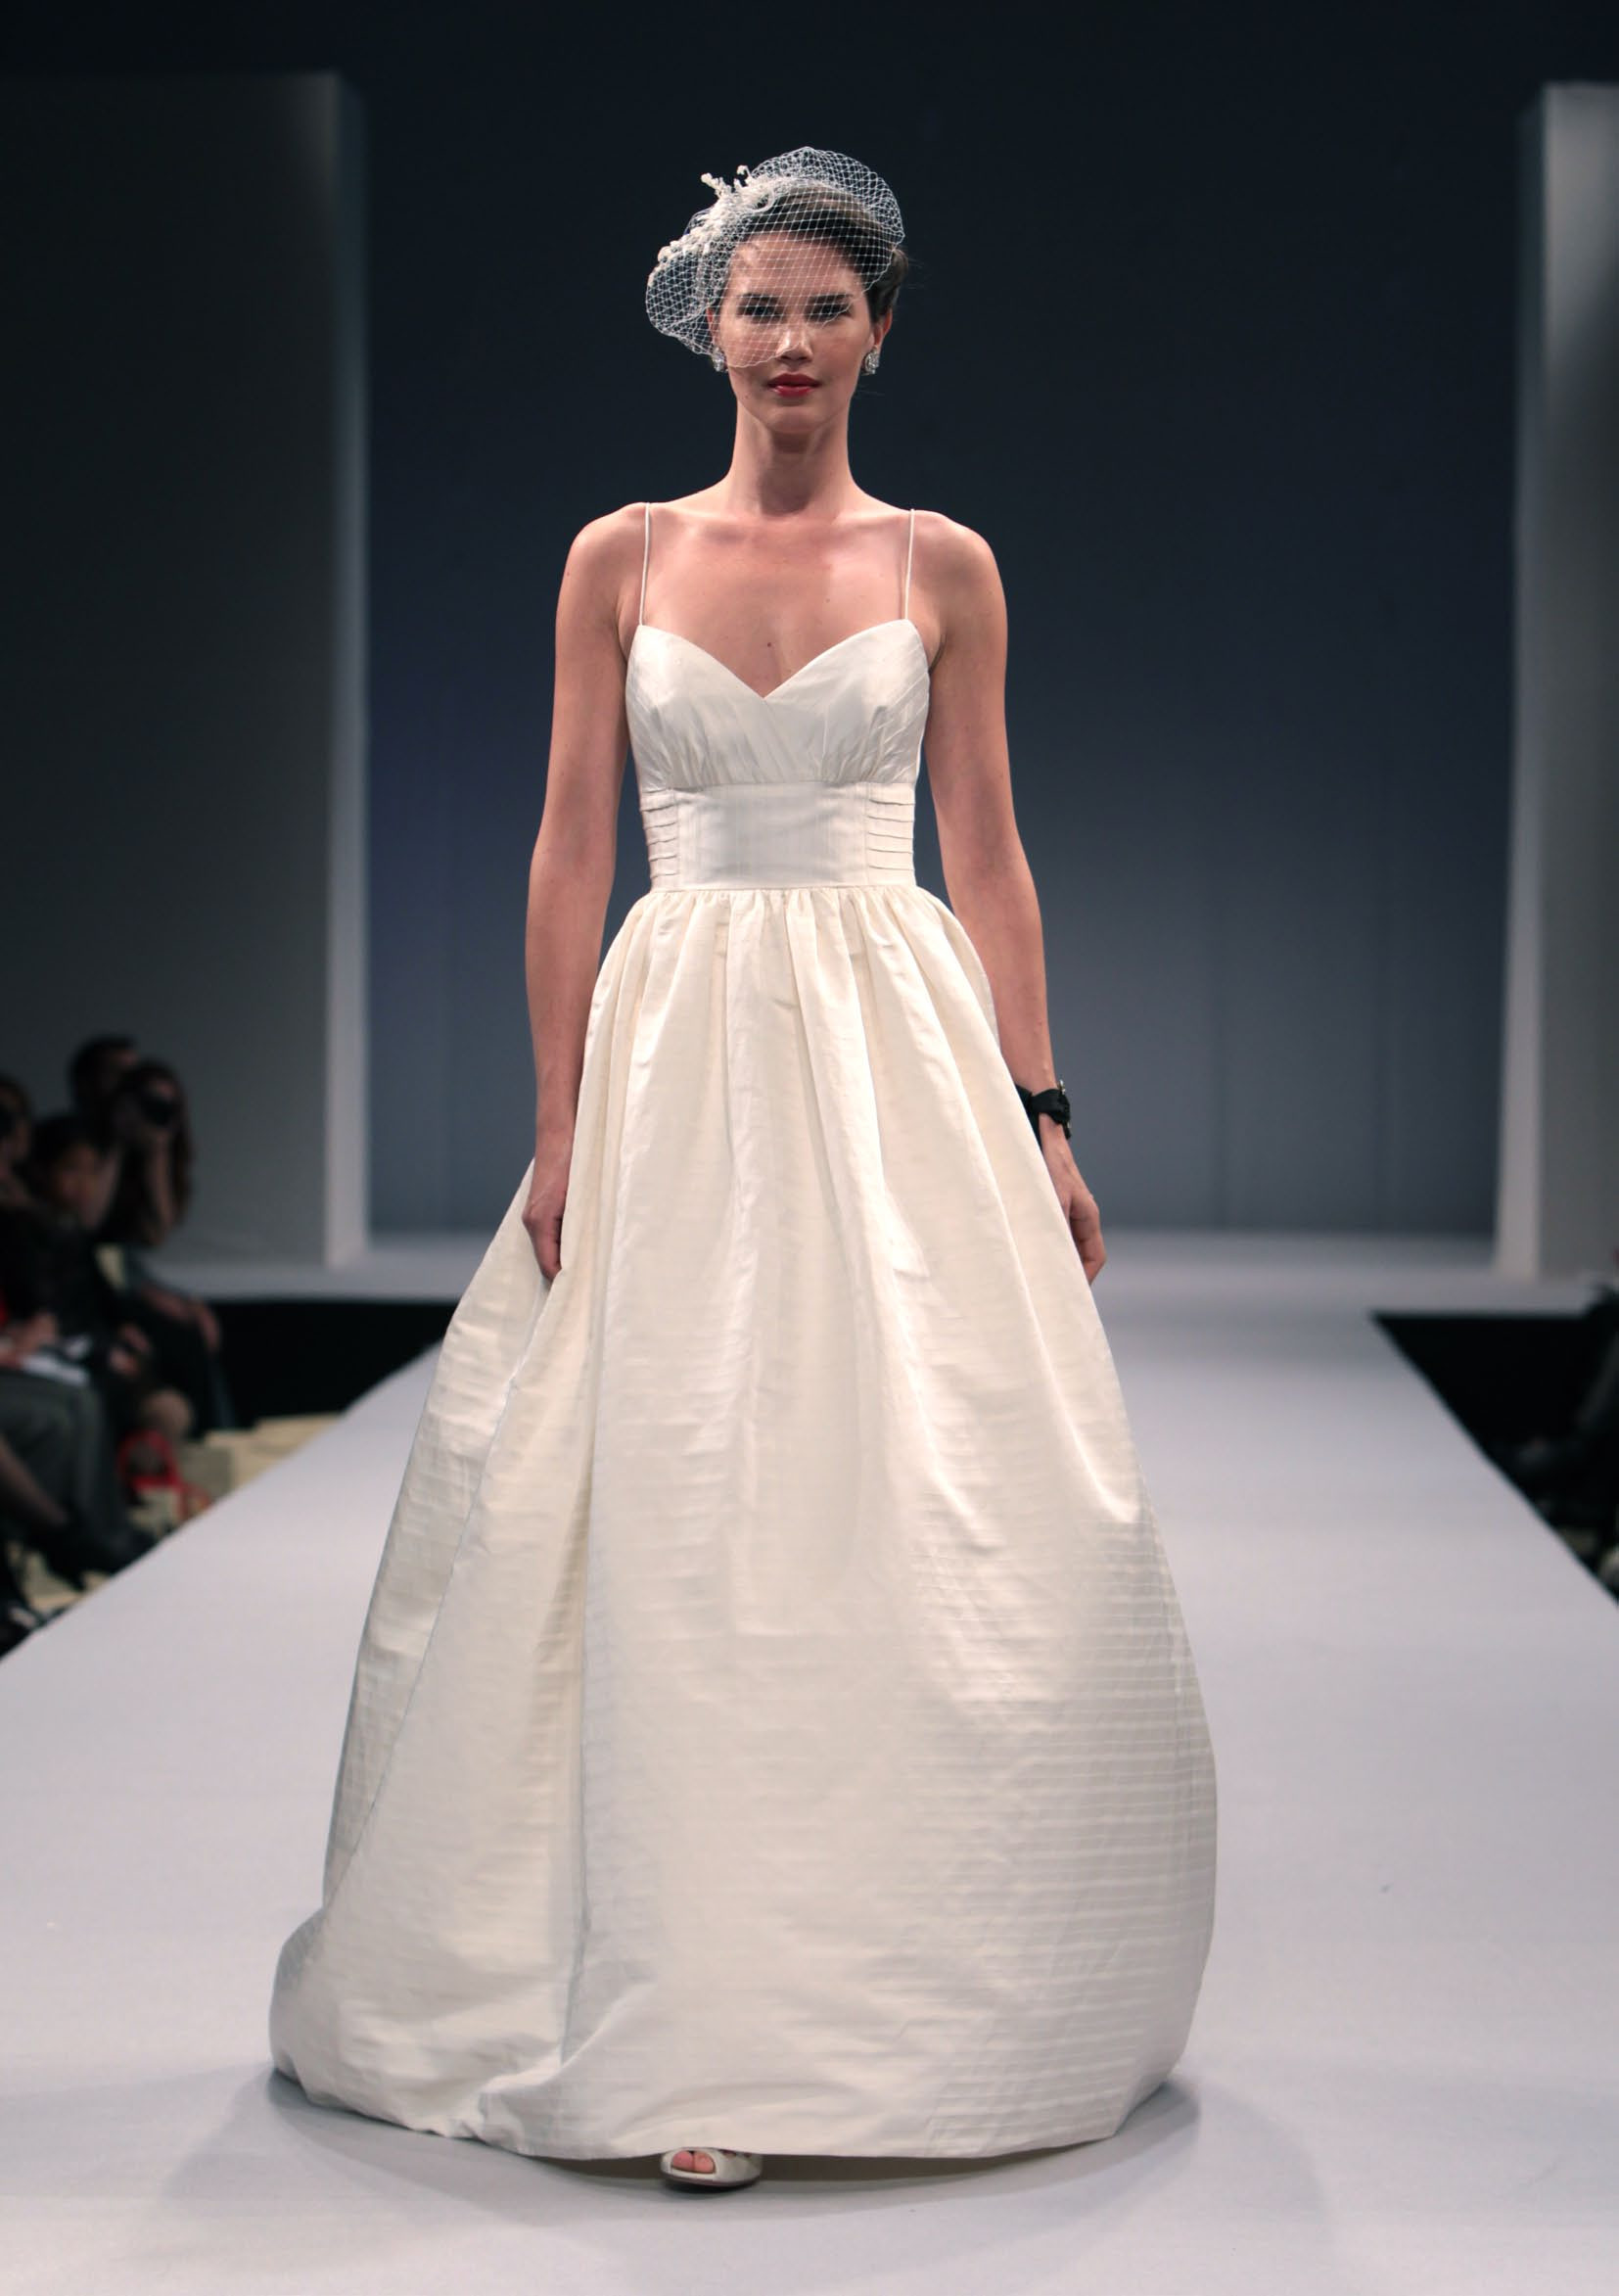 Spaghetti Strap Ball Gown Wedding Dress  Spaghetti Strap Wedding Dresses